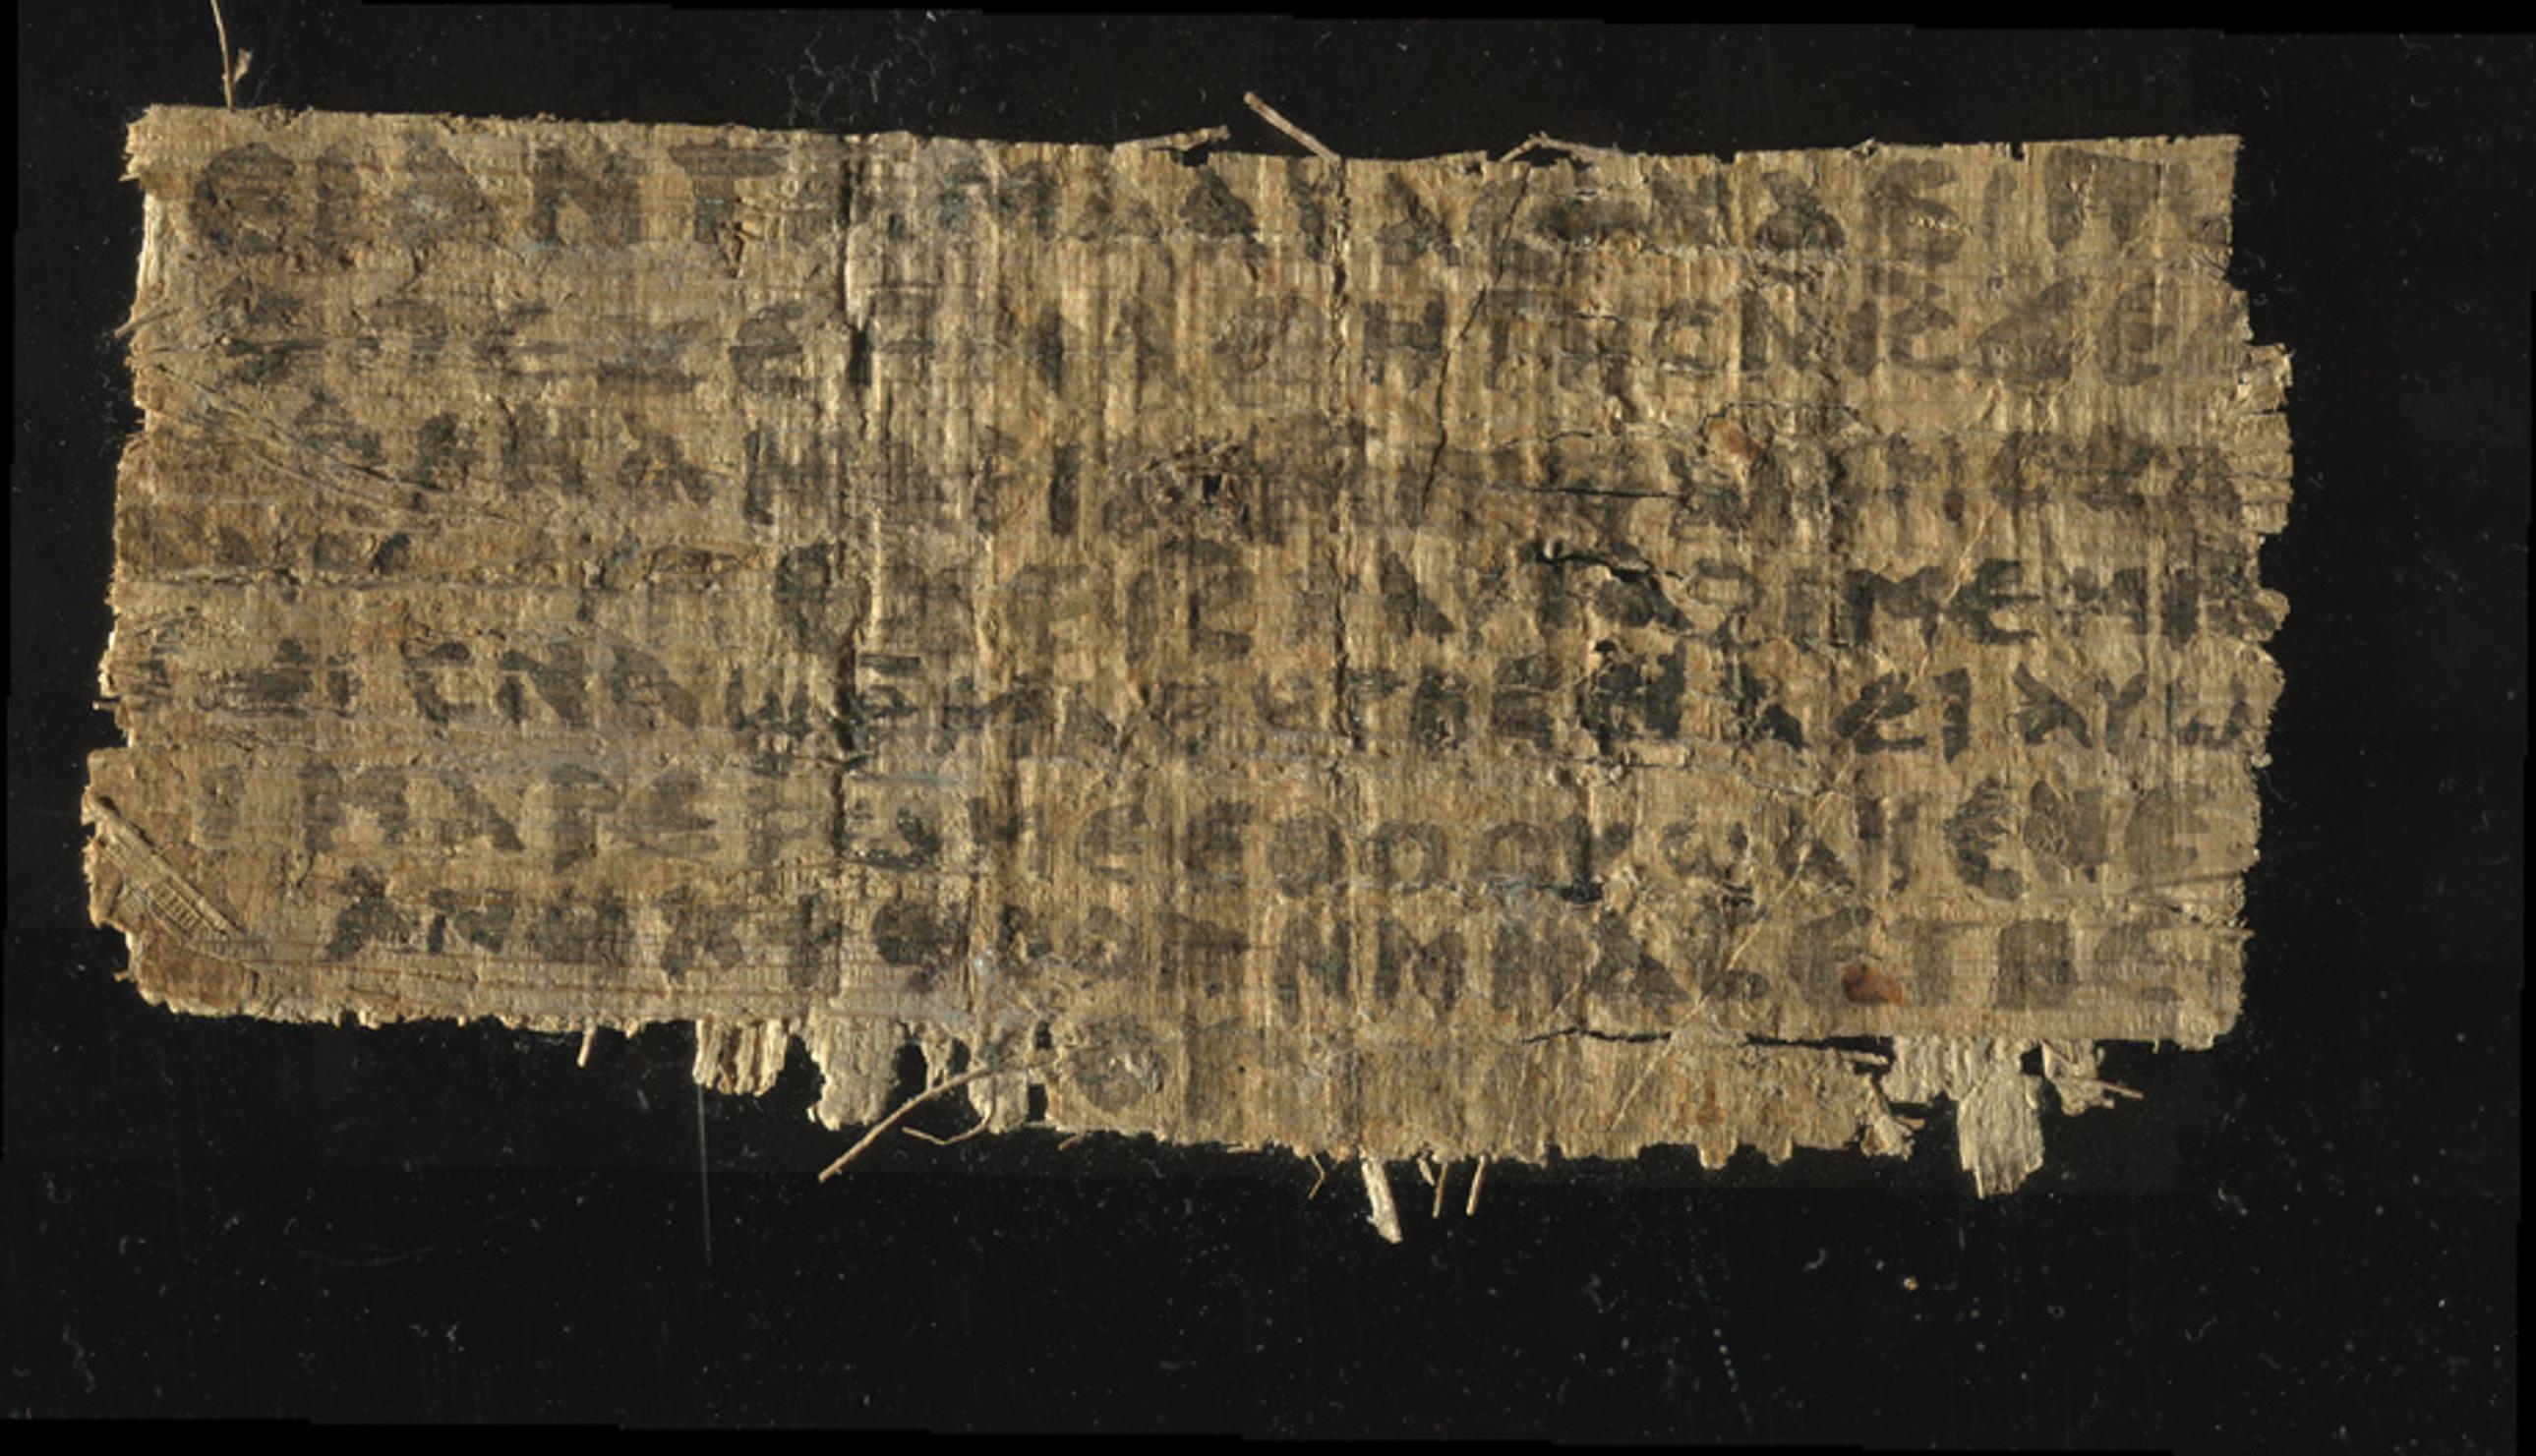 Image: Papyrus